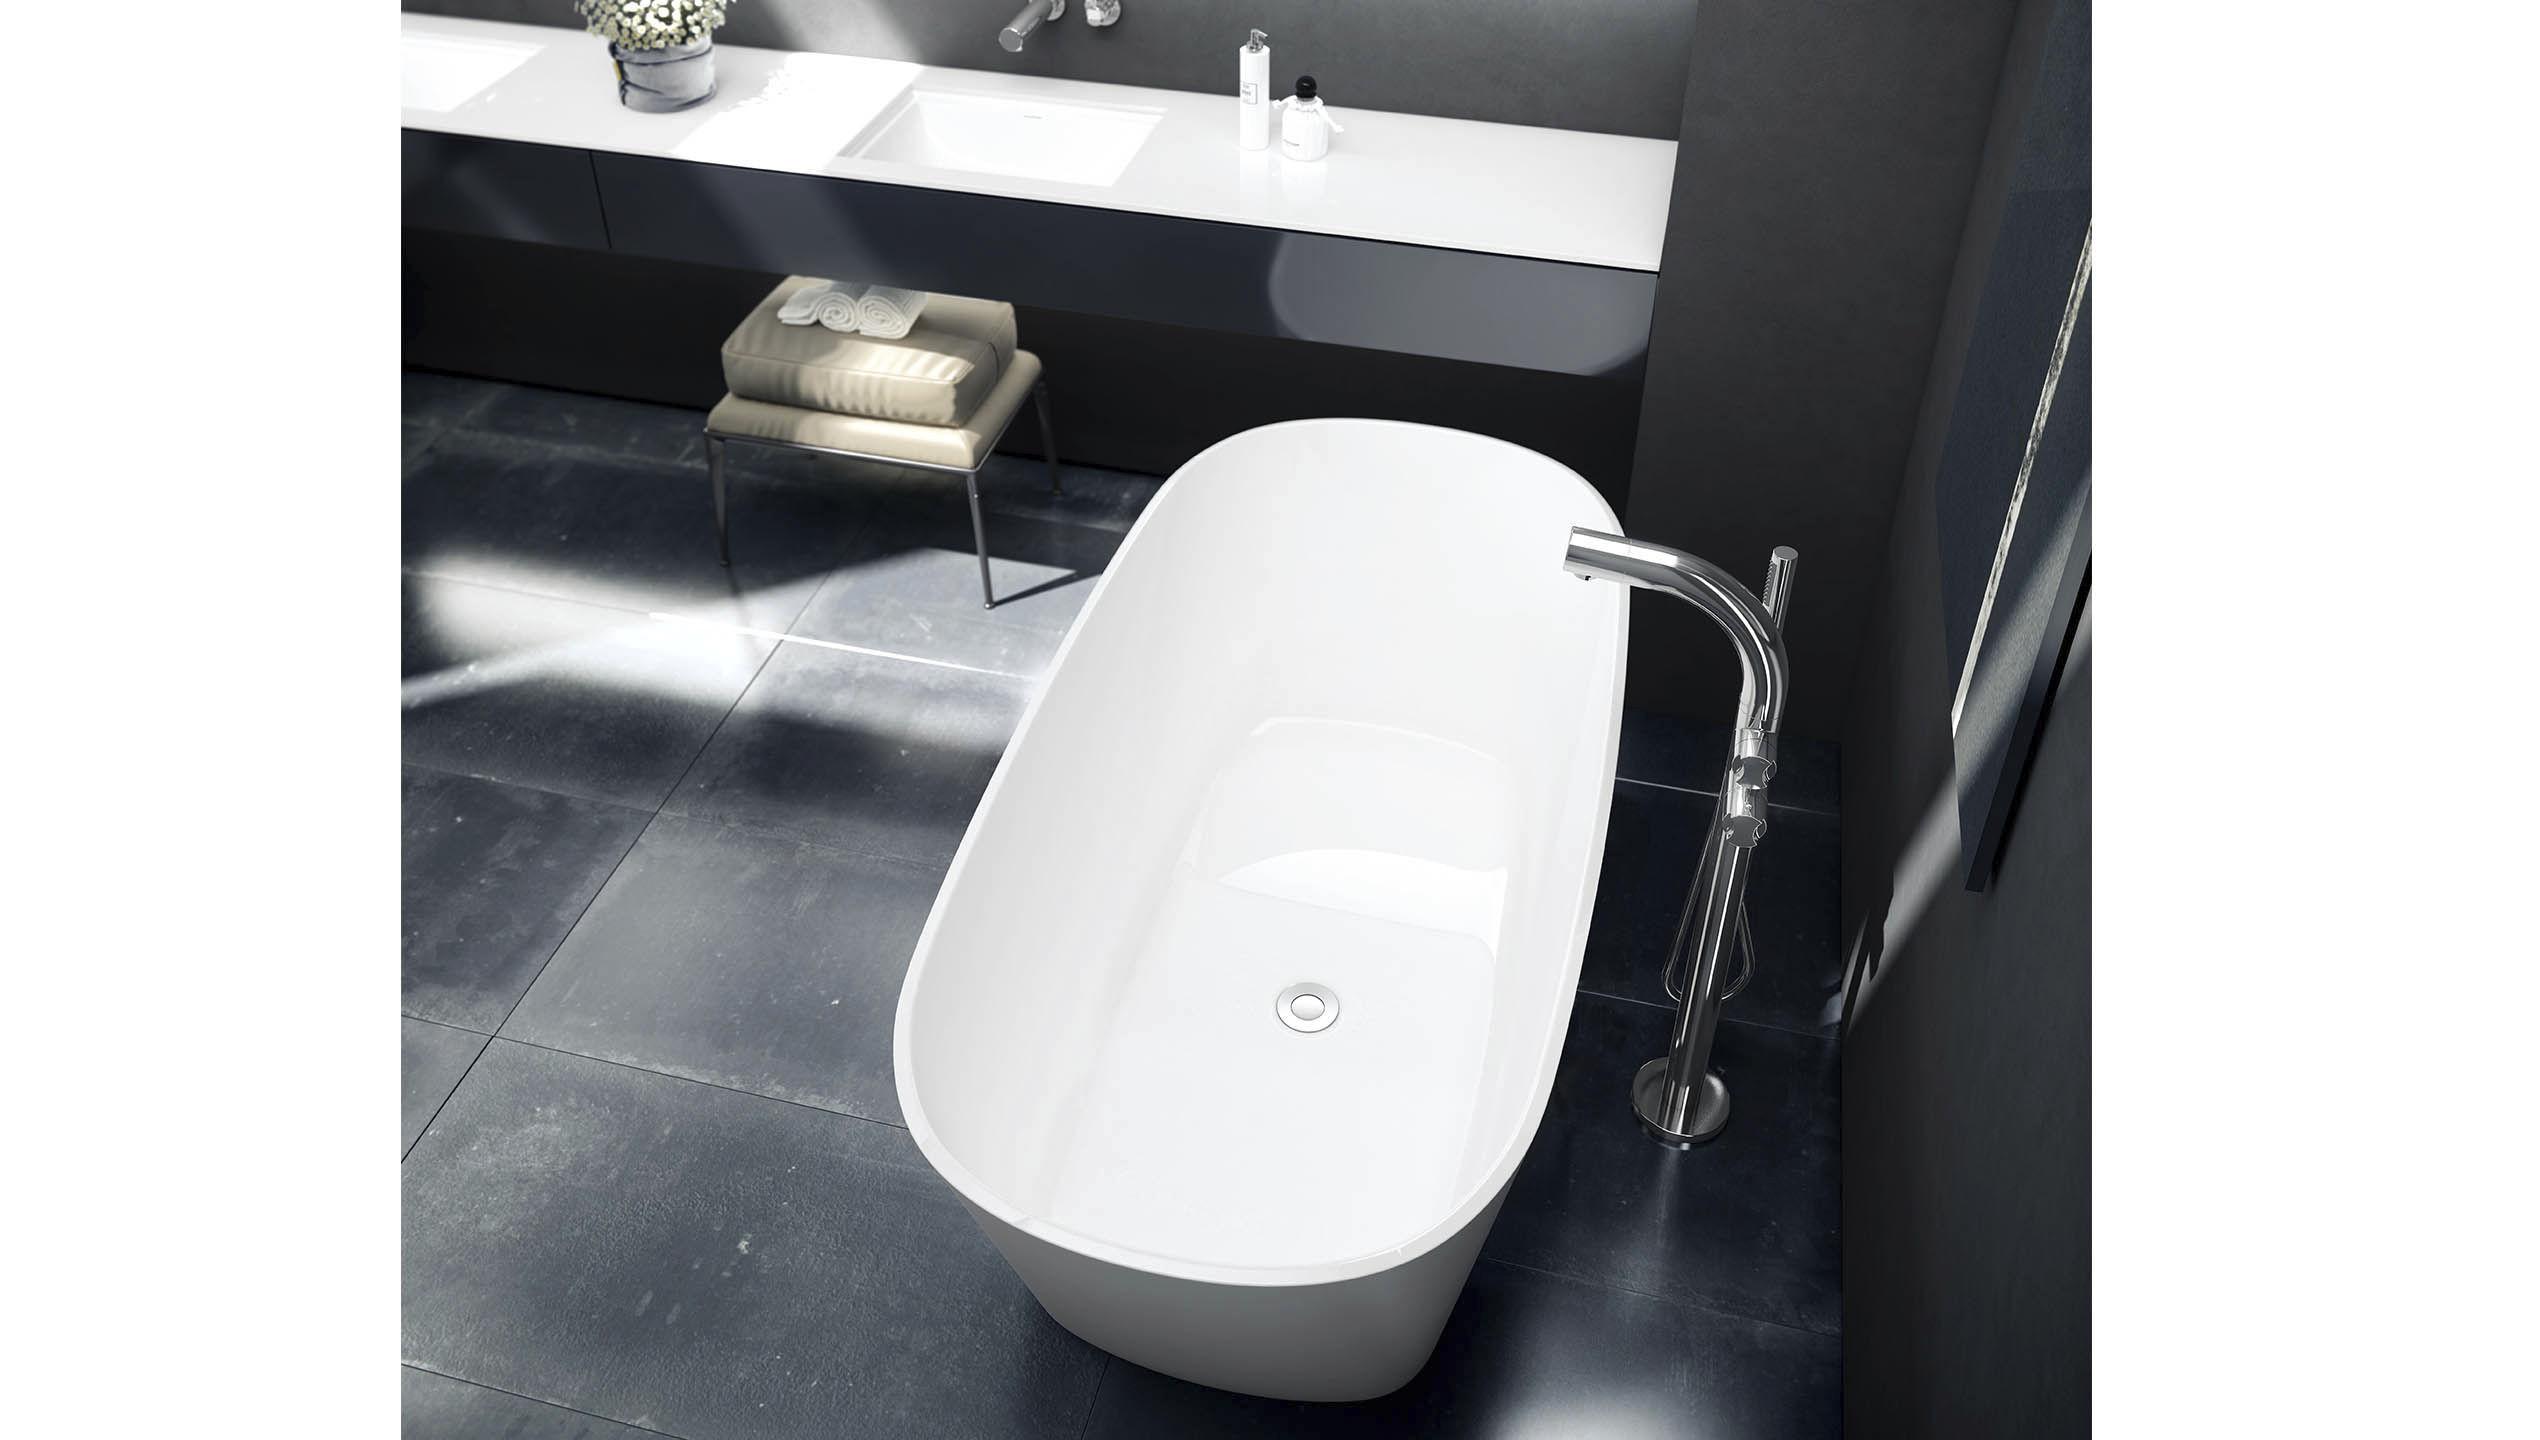 Vasca Da Bagno Amalfi Prezzo : Vasca da bagno ad isola ovale in resina in pietra calcarea